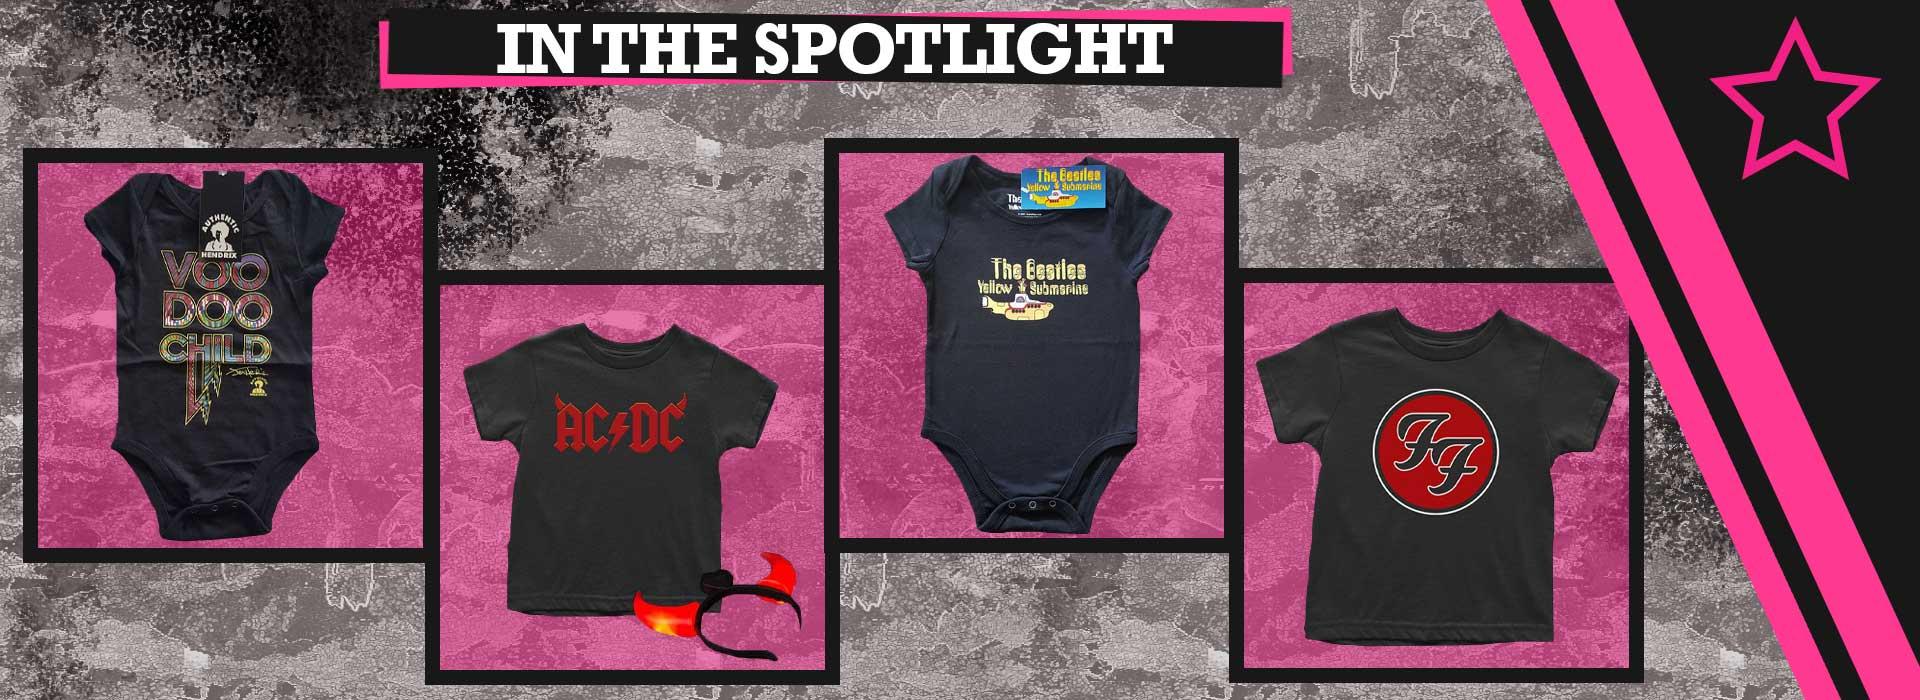 In the spotlight! Jimi Hendrix AC/DC The Beatles Foo Fighters